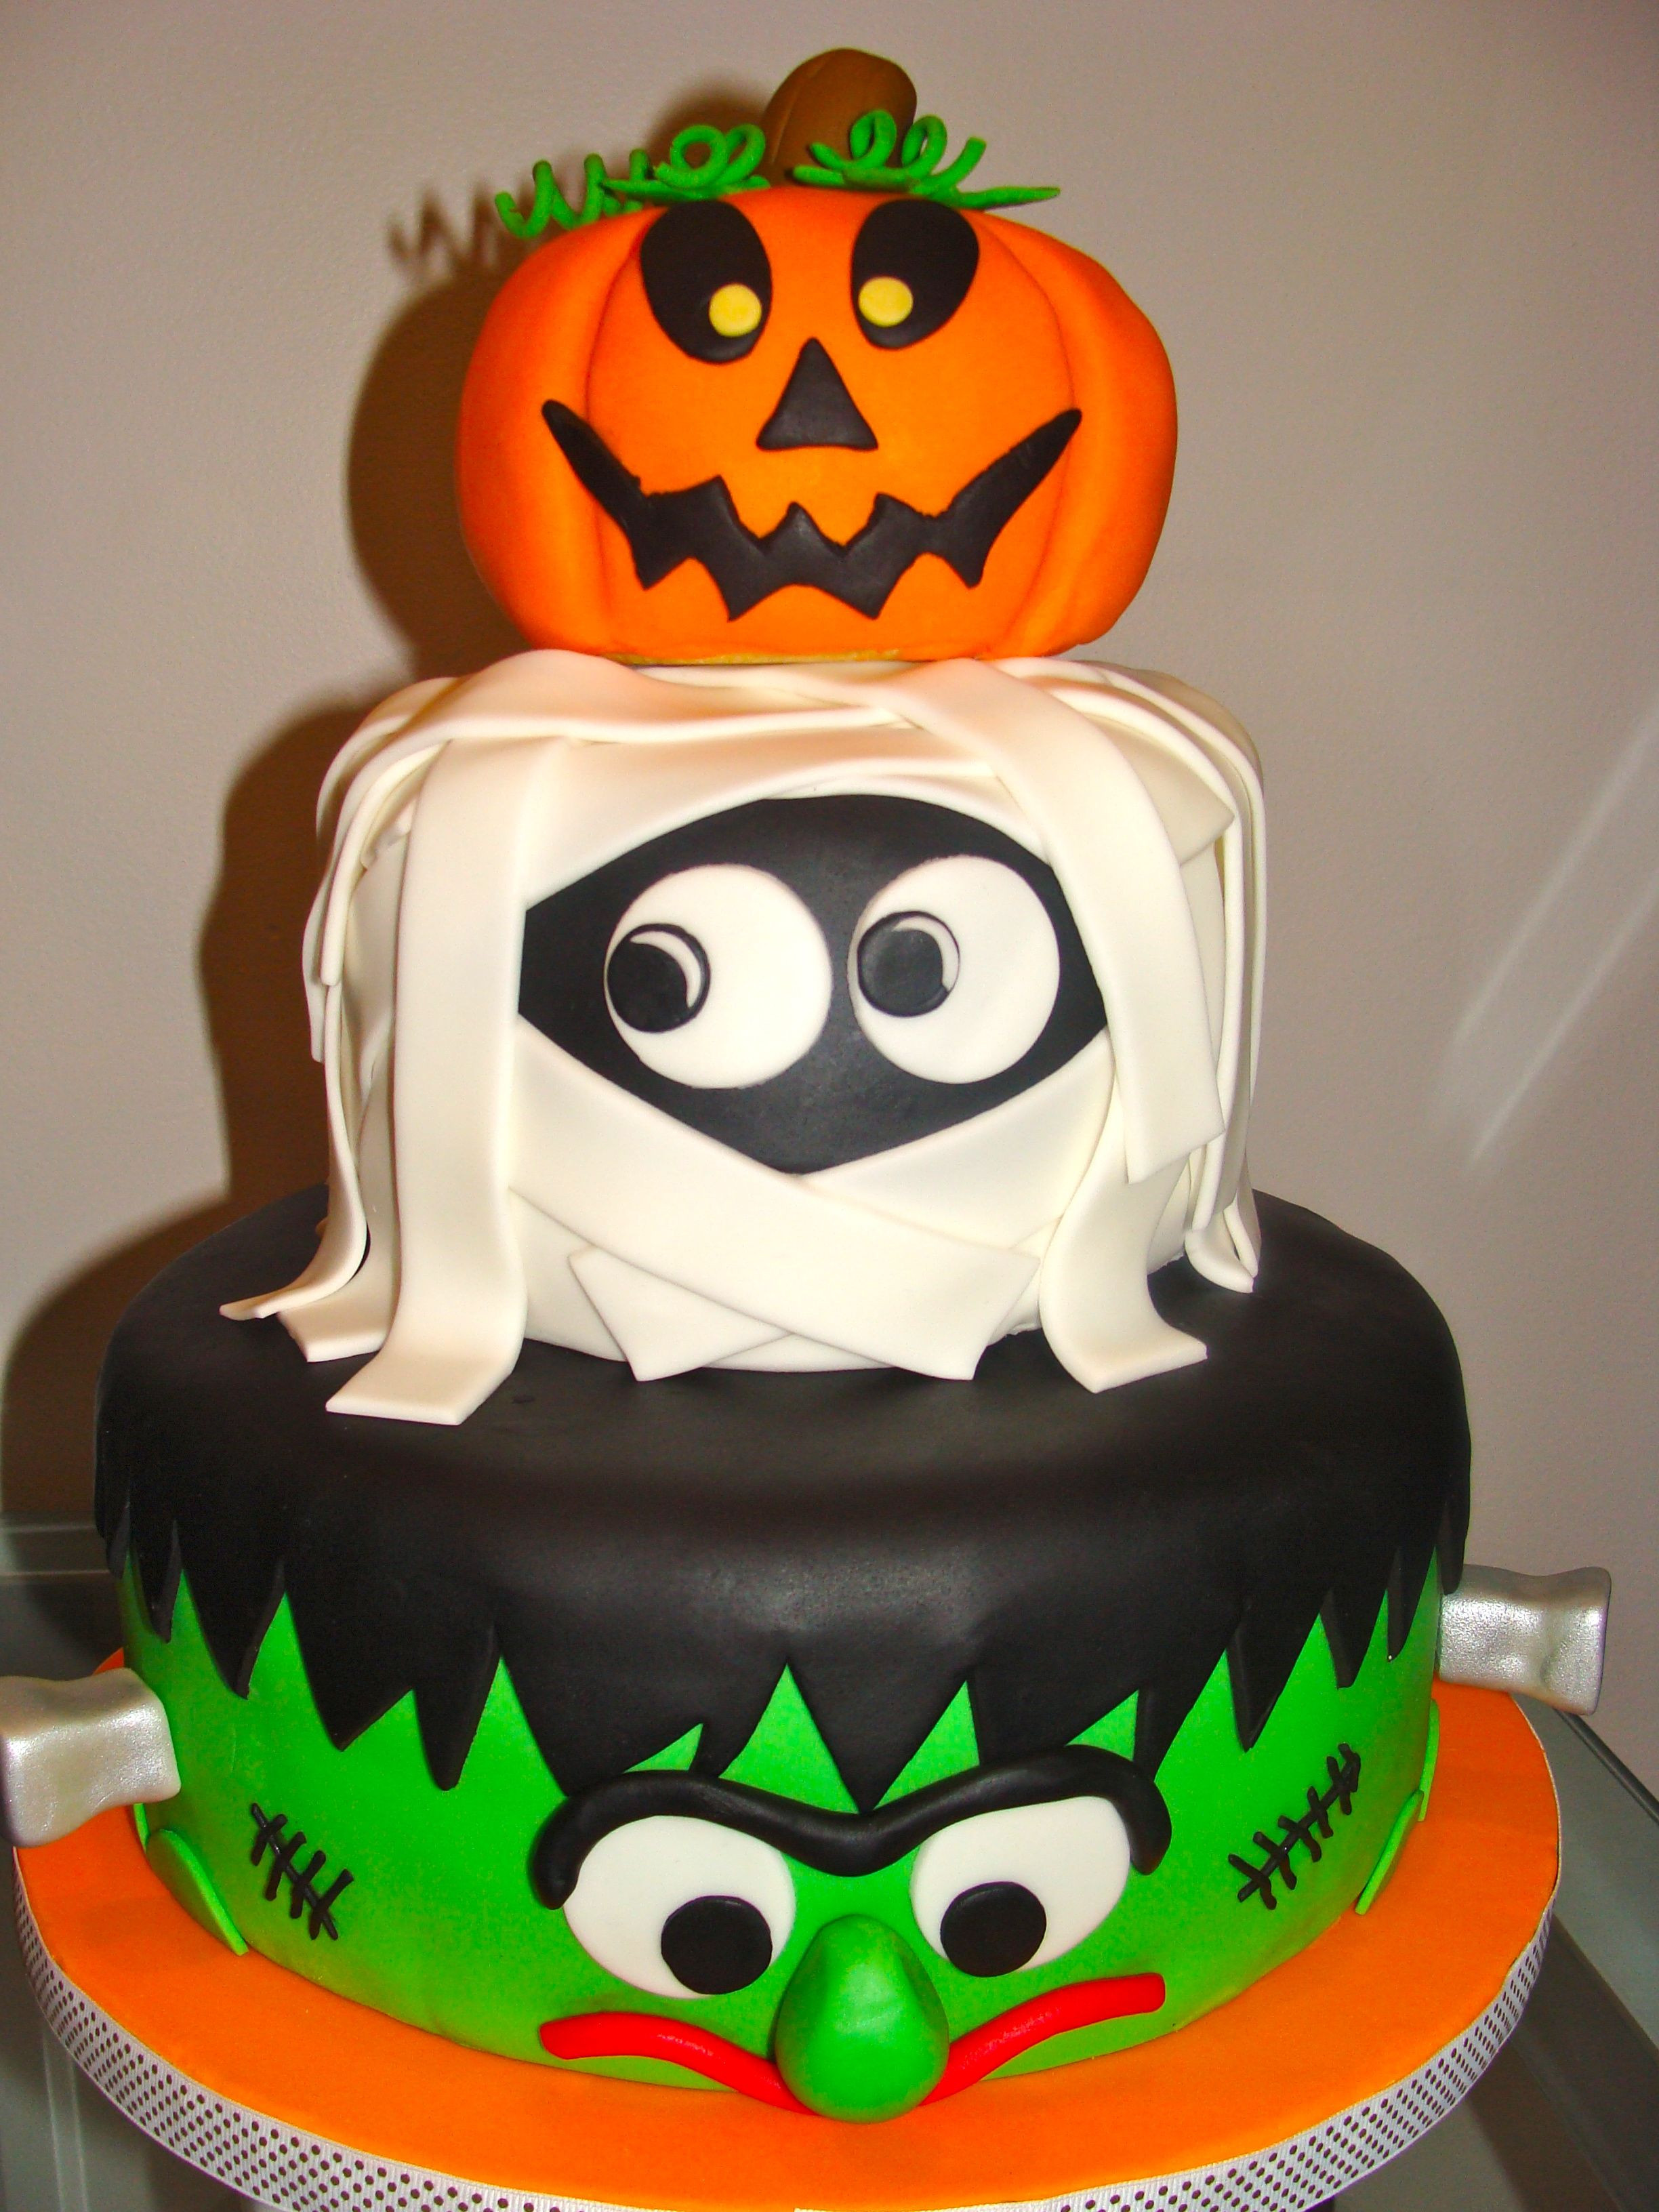 Halloween Birthday Cakes For Kids  21 Amazing Halloween Cake Ideas Halloween cakes